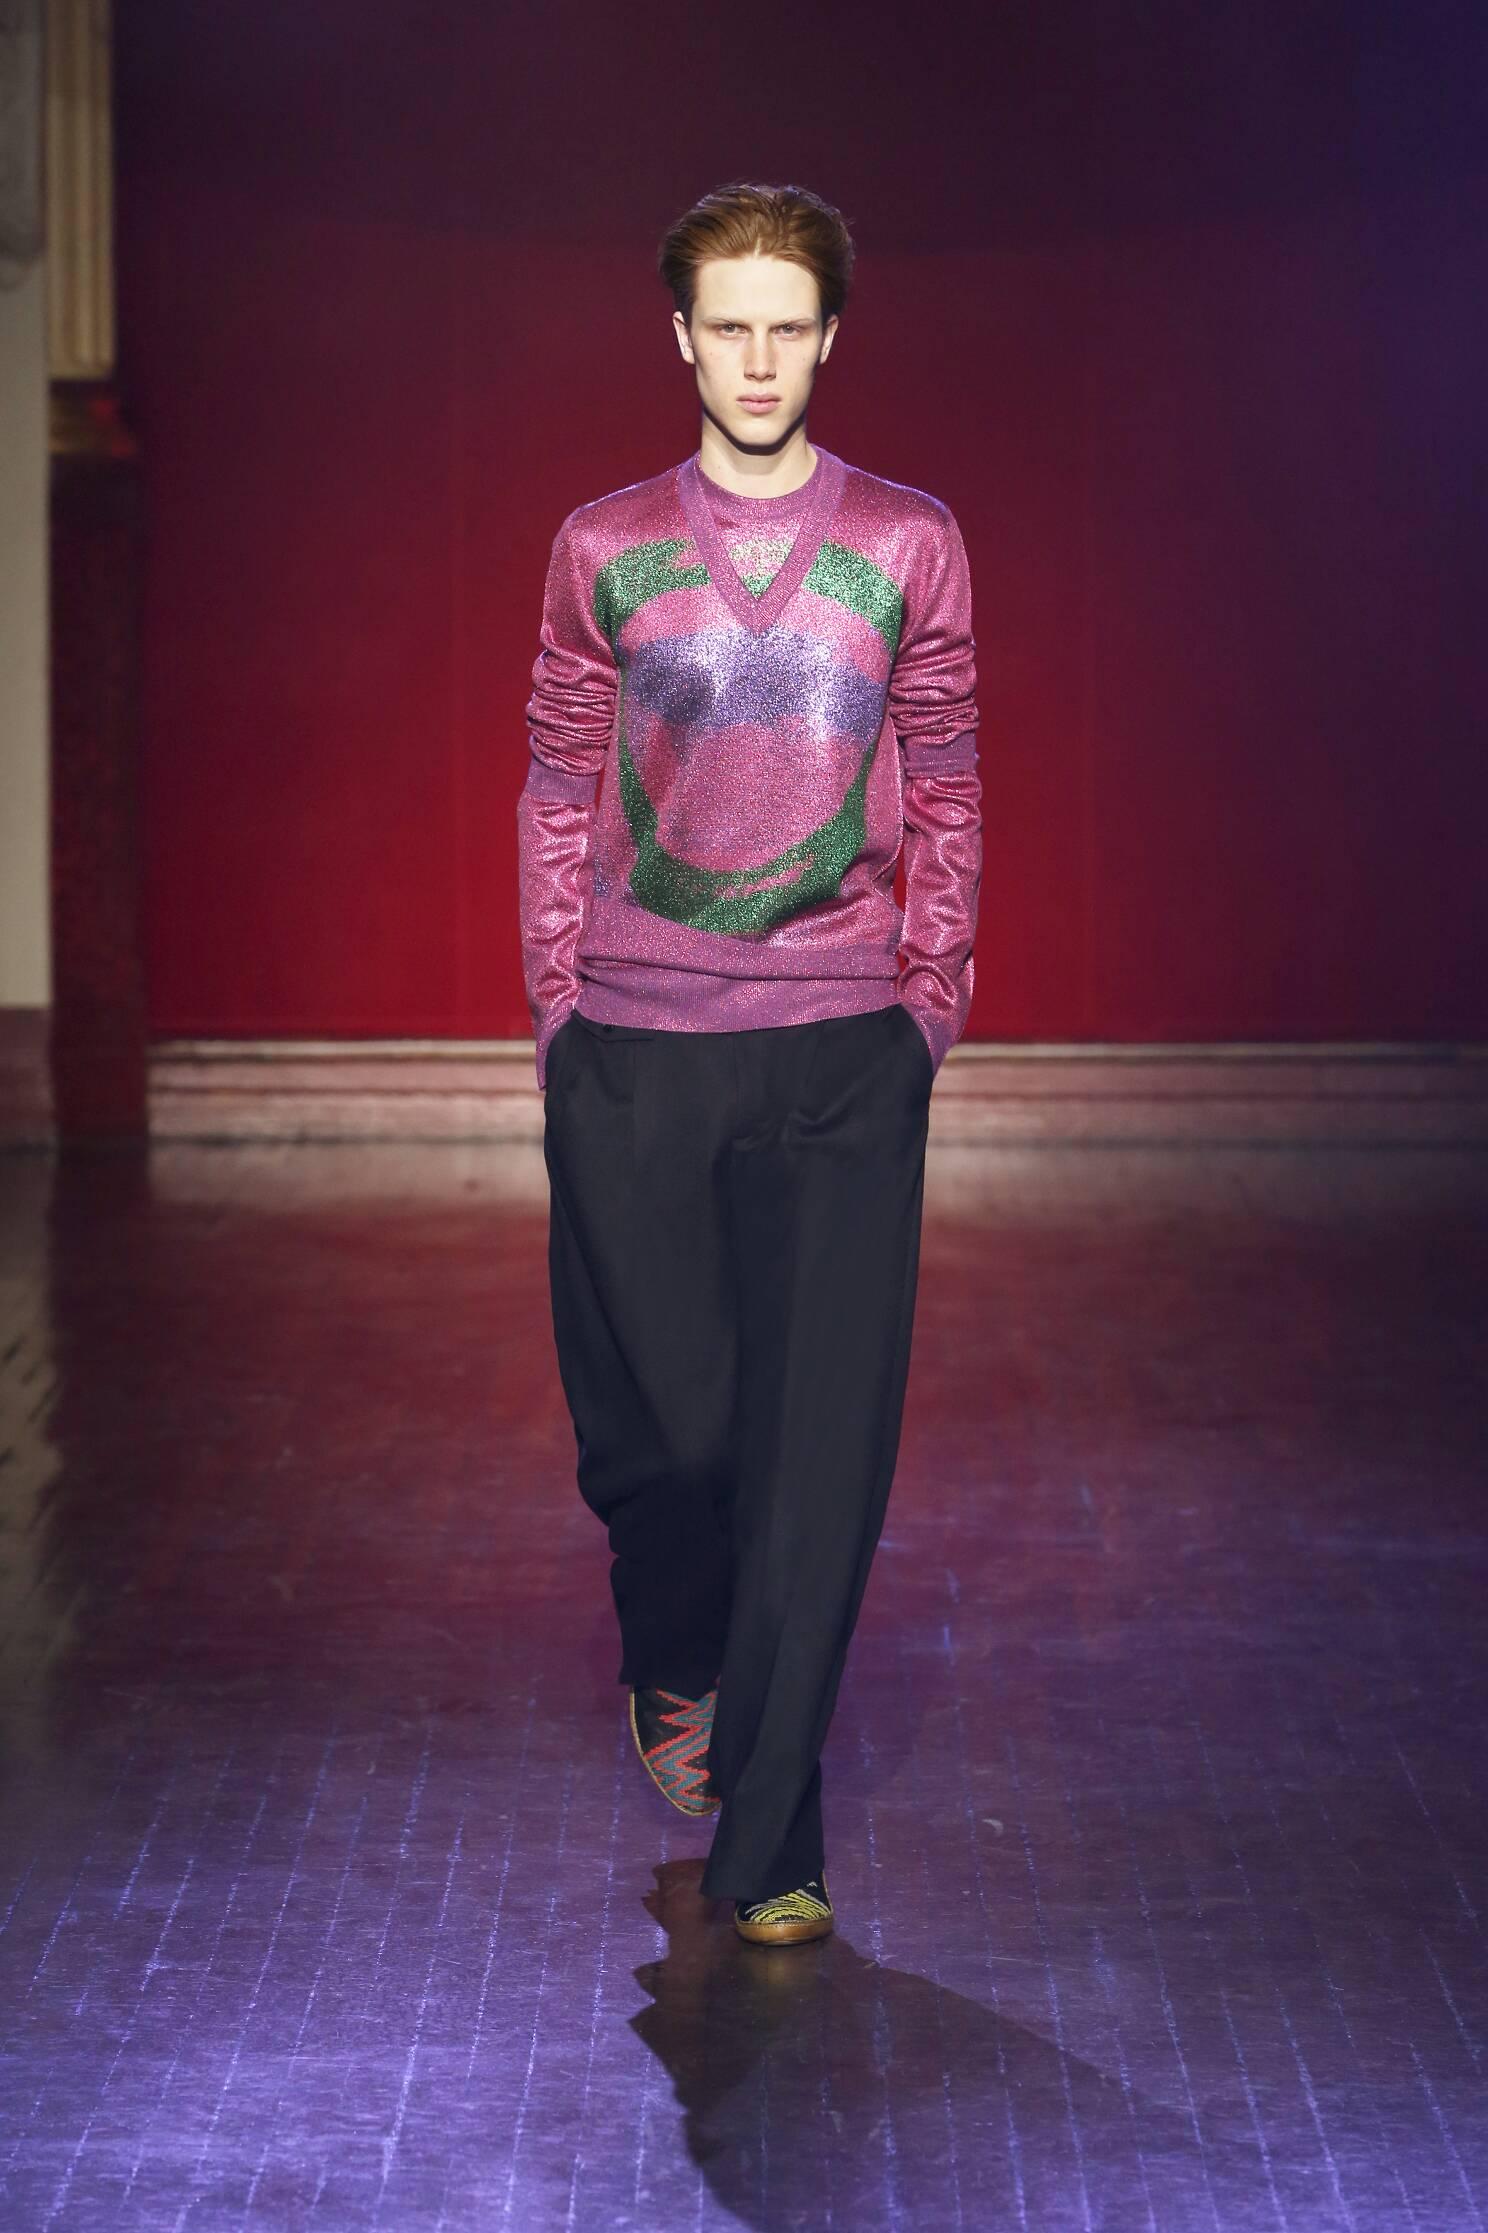 Catwalk Maison Margiela Menswear Collection Winter 2015